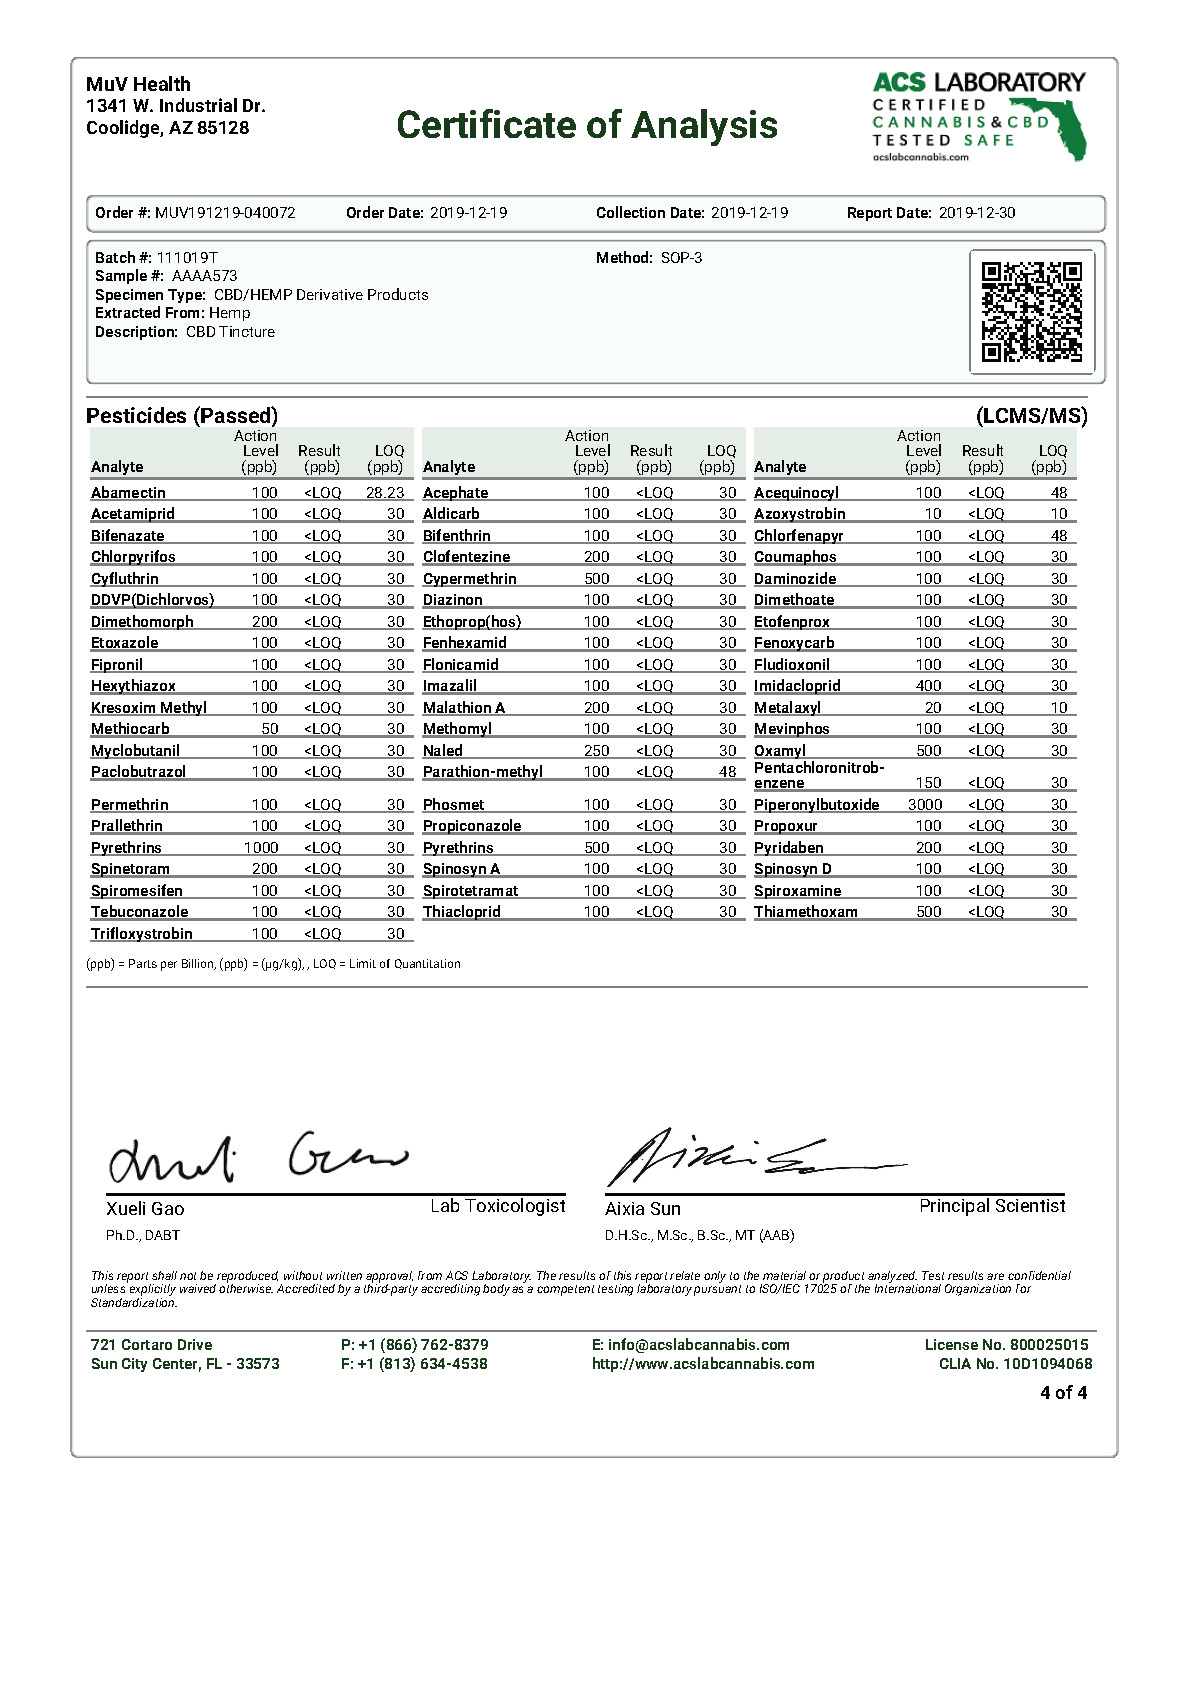 muv-cbd-tincture-coa-111019t-page-4.jpg